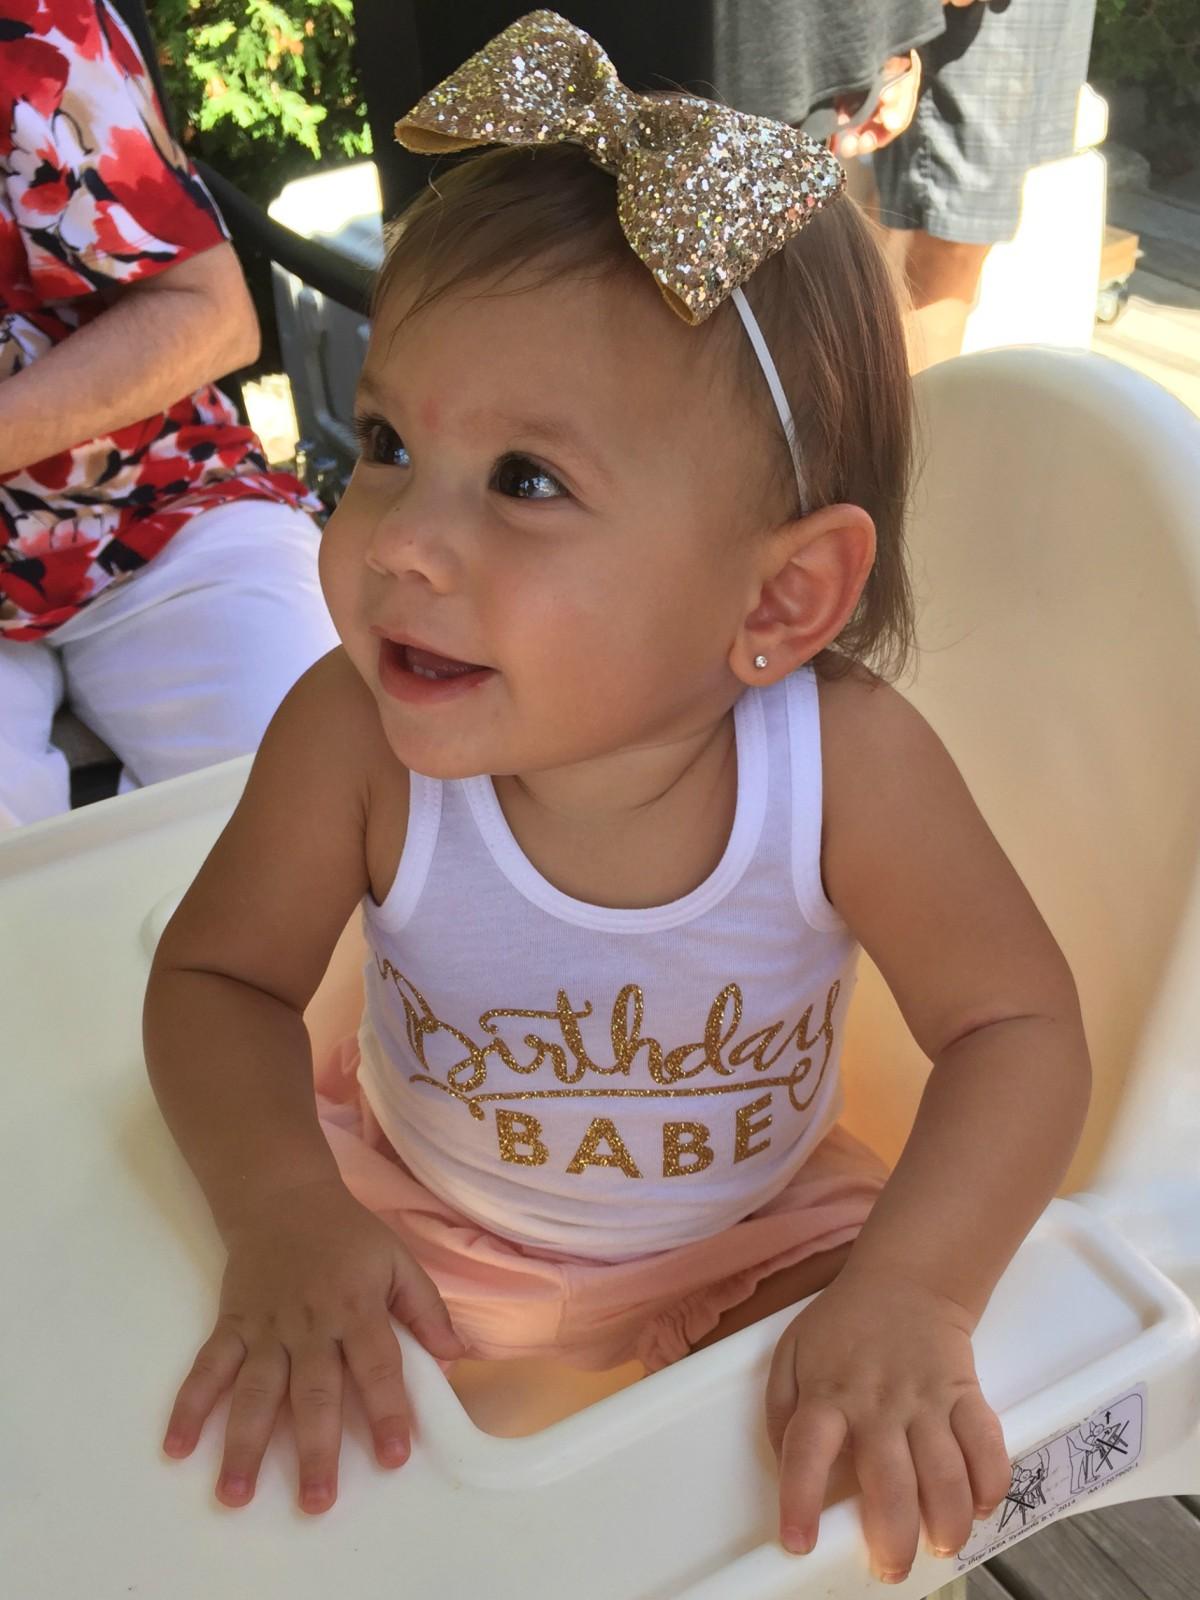 birthday babe, lola and darla birthday babe top, kutie bow tuties birthday bow crown